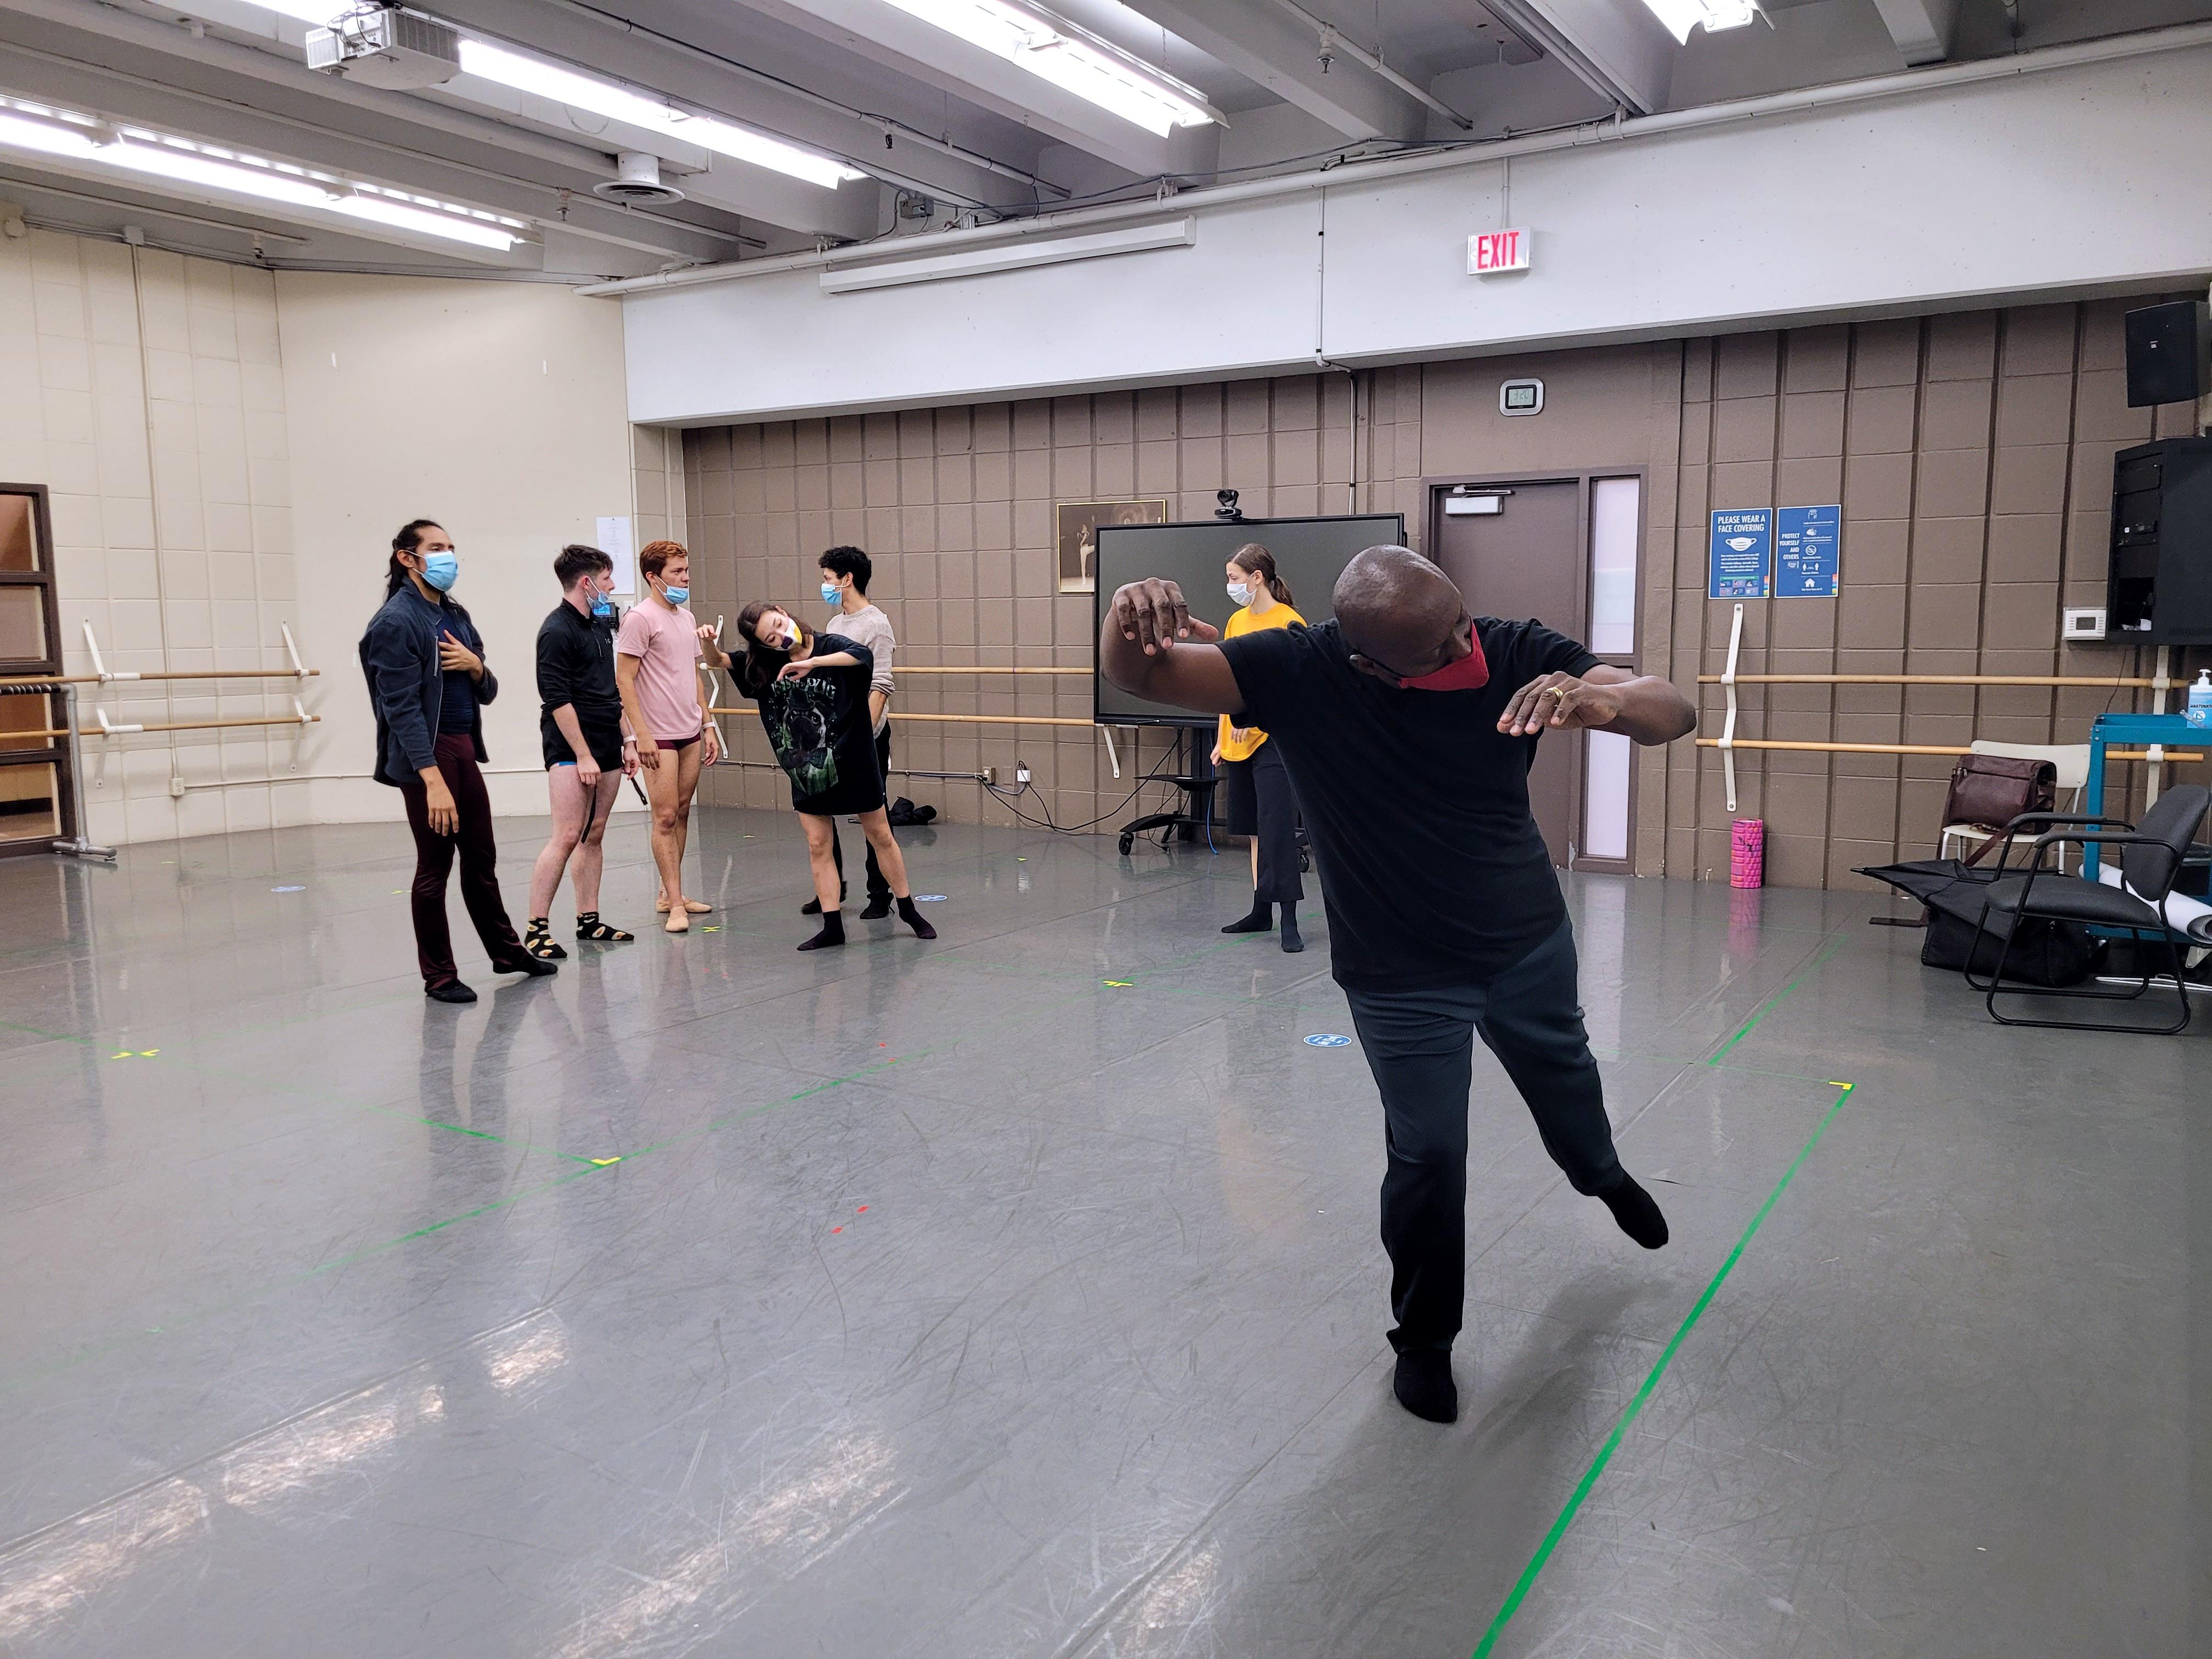 Dream Talker: Jose Angel Carret Ballet Jörgen in the studios choreography